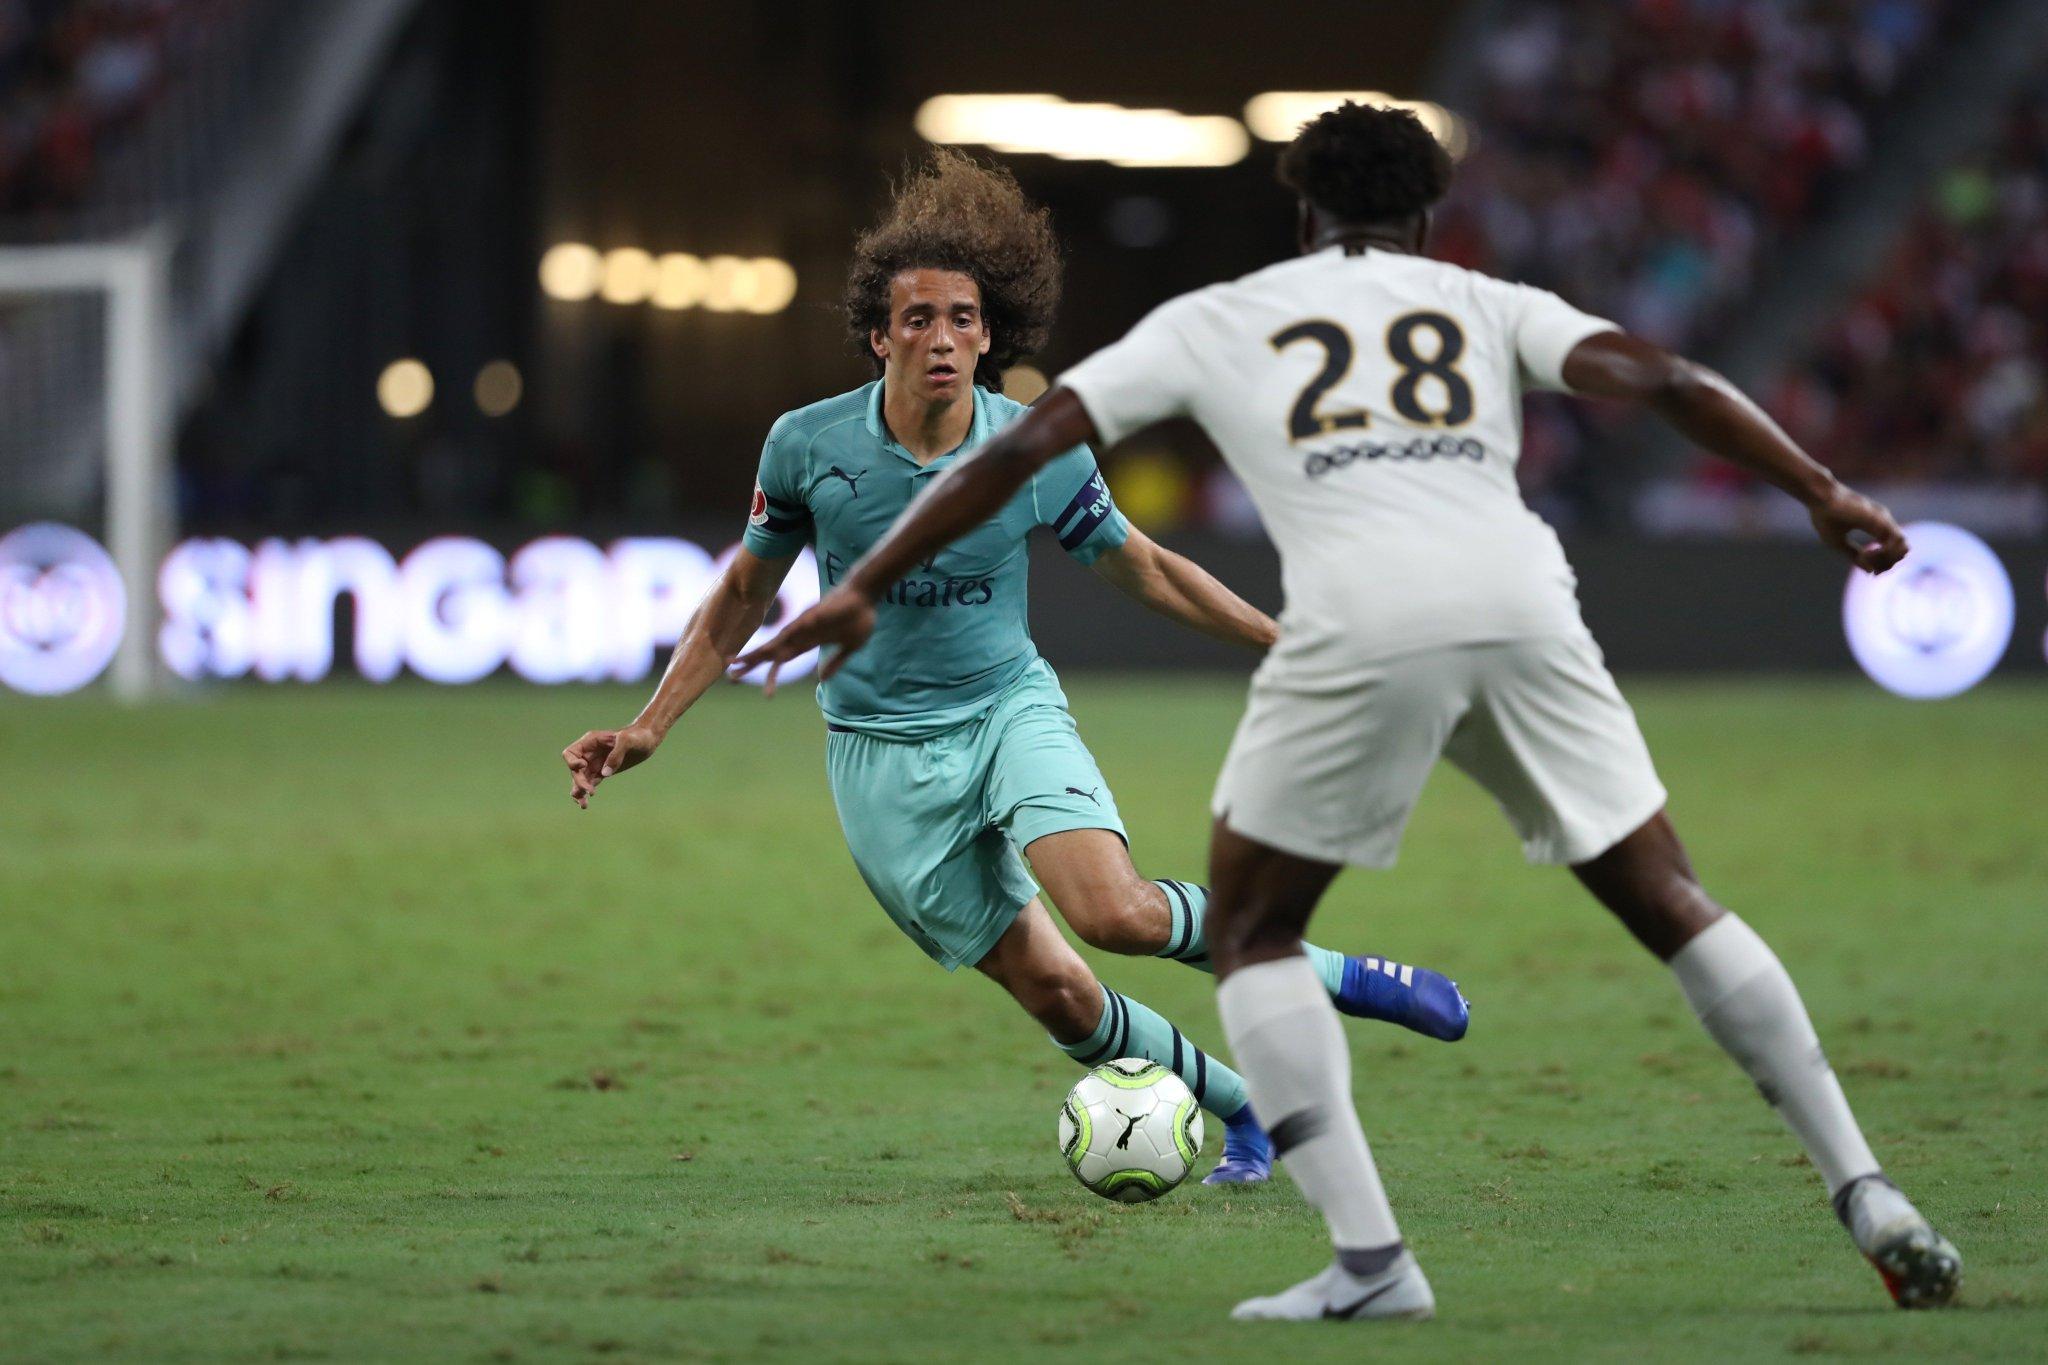 Arsenal 5-1 PSG Highlights, Goals & Match Replay